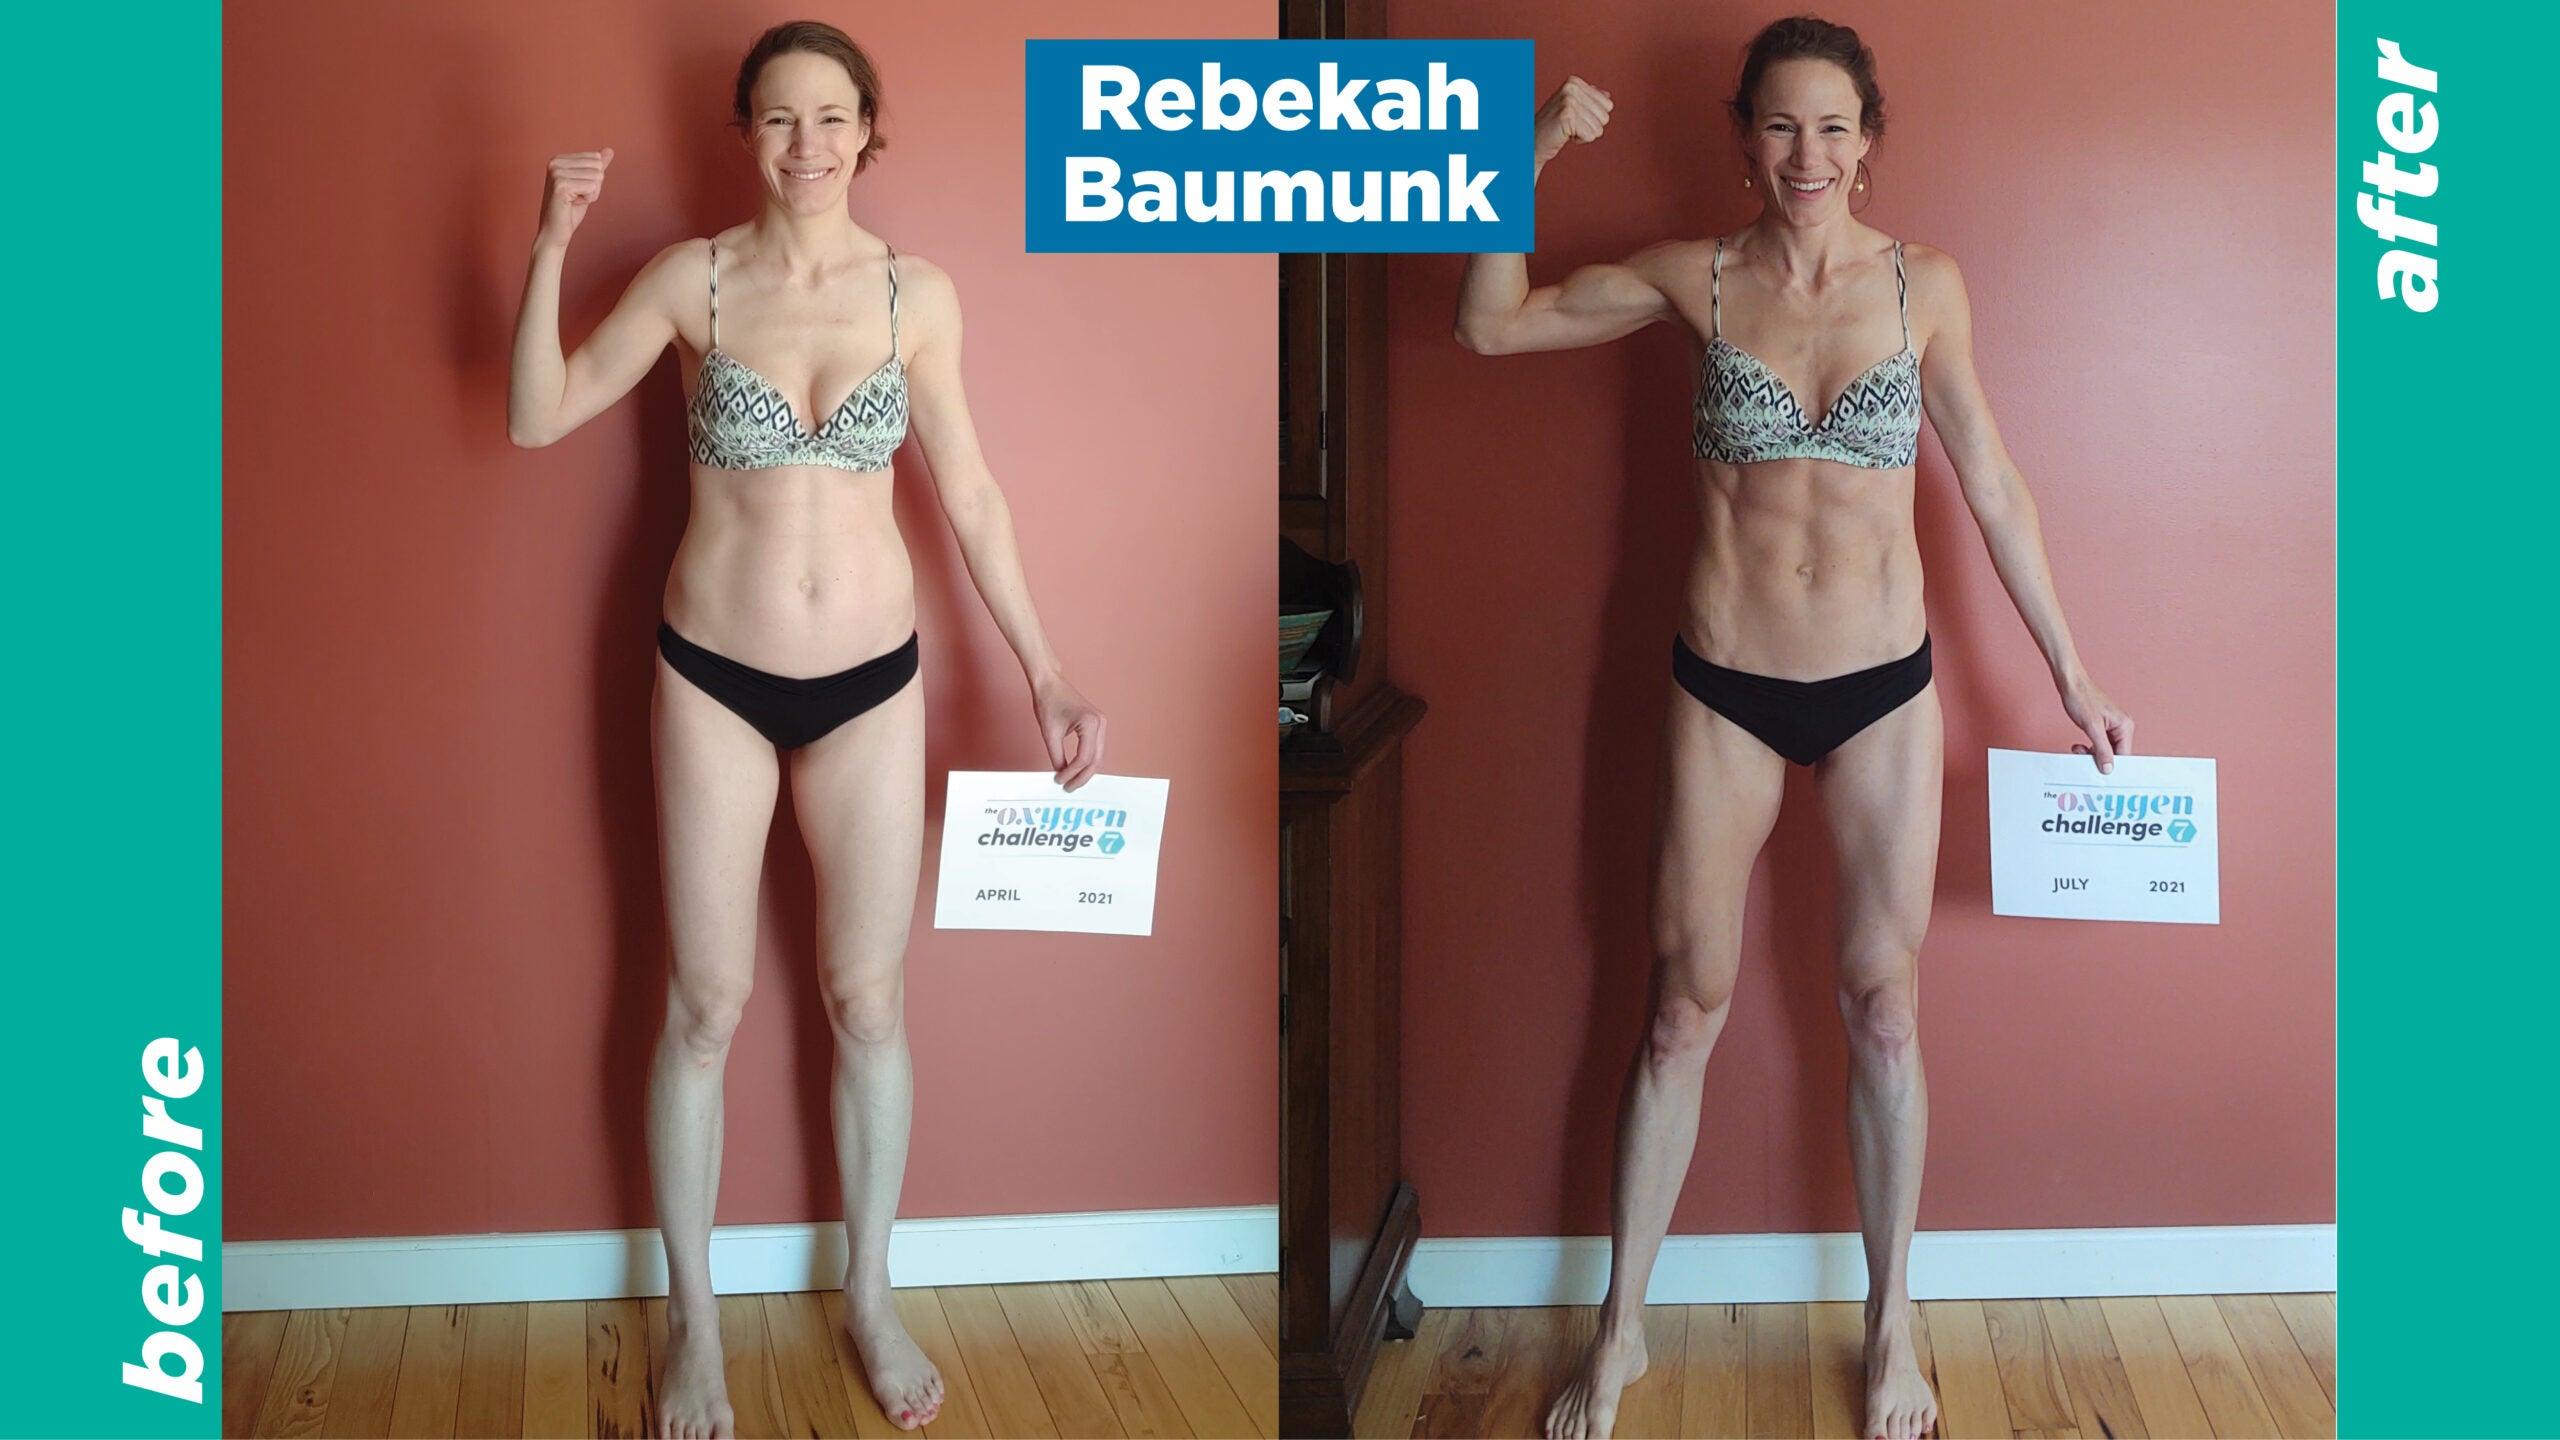 Rebekah Baumunk 2